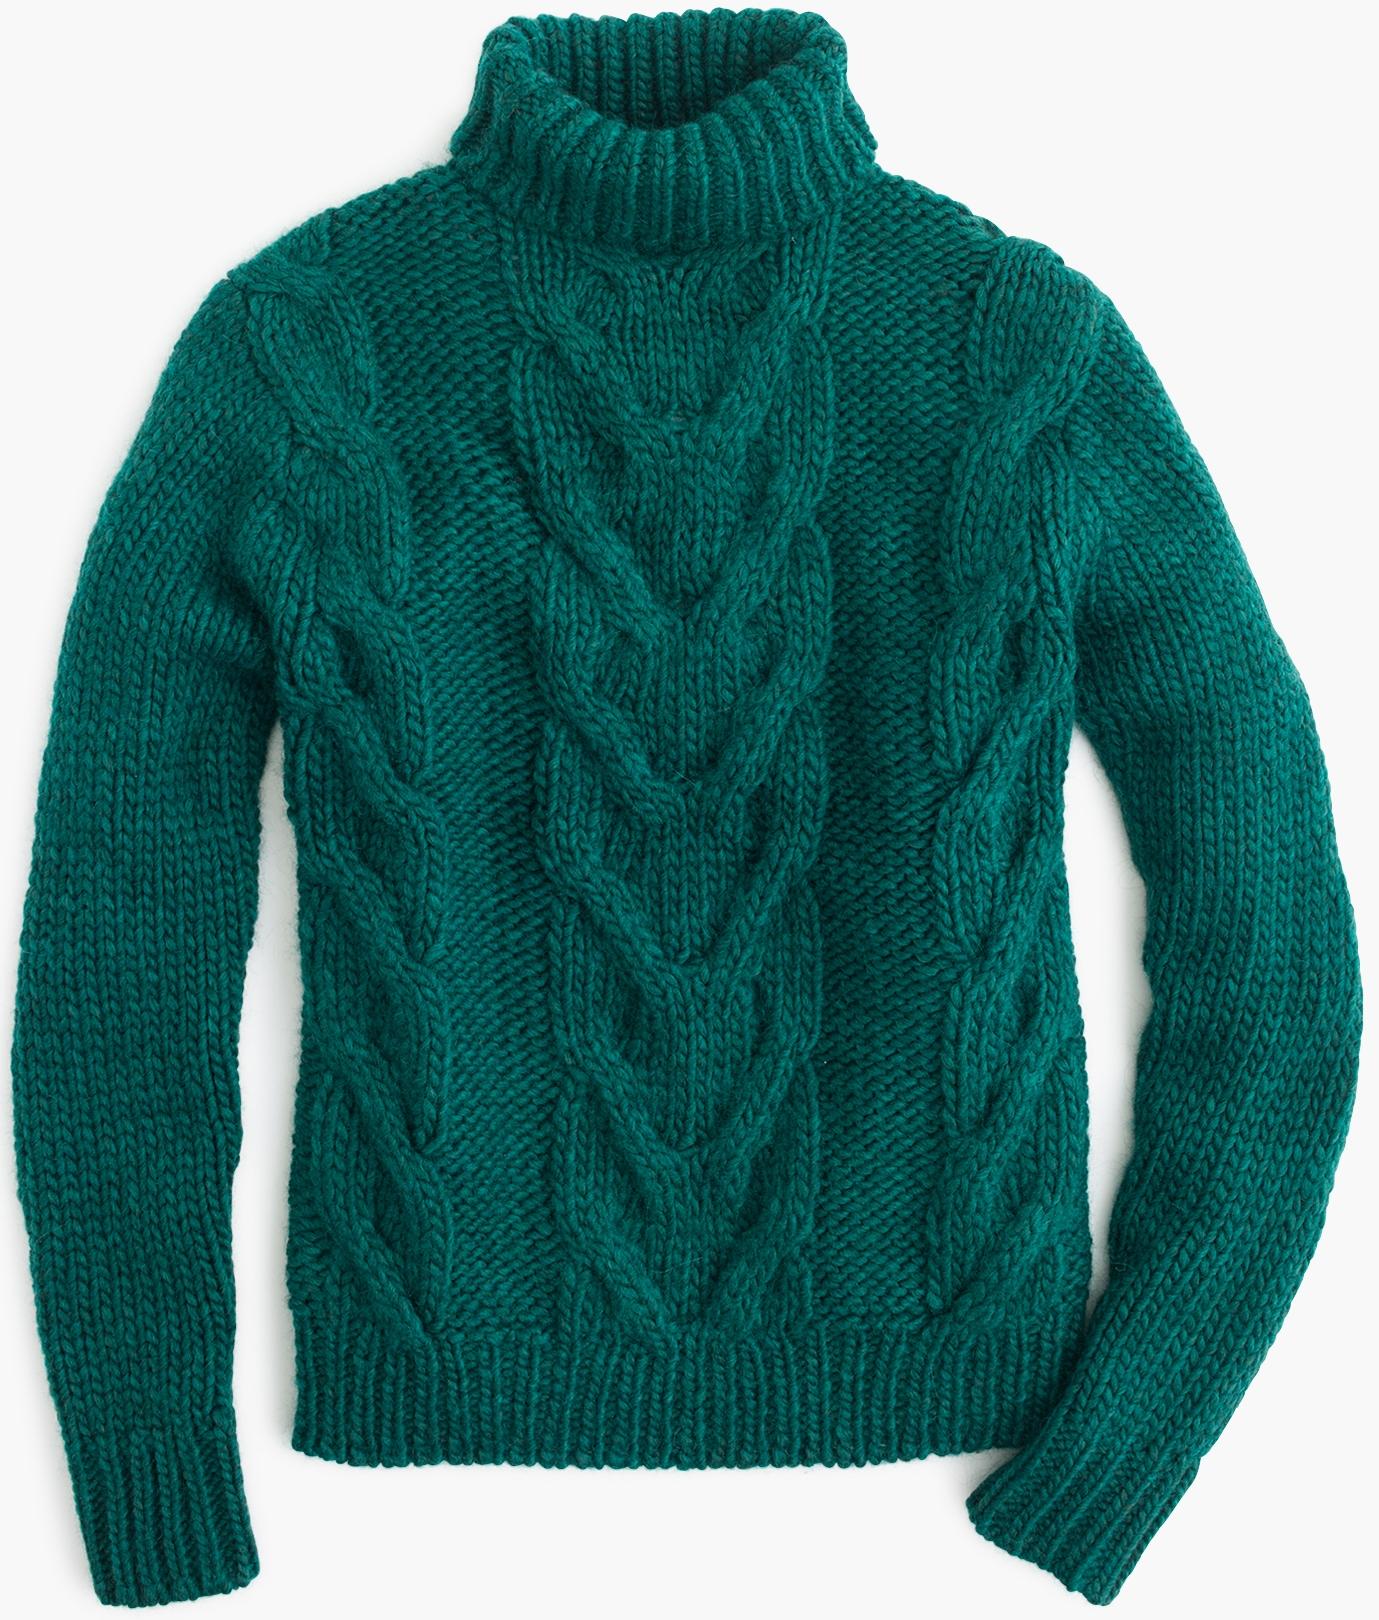 J.Crew Italian Wool Cable Turtleneck Sweater, $168